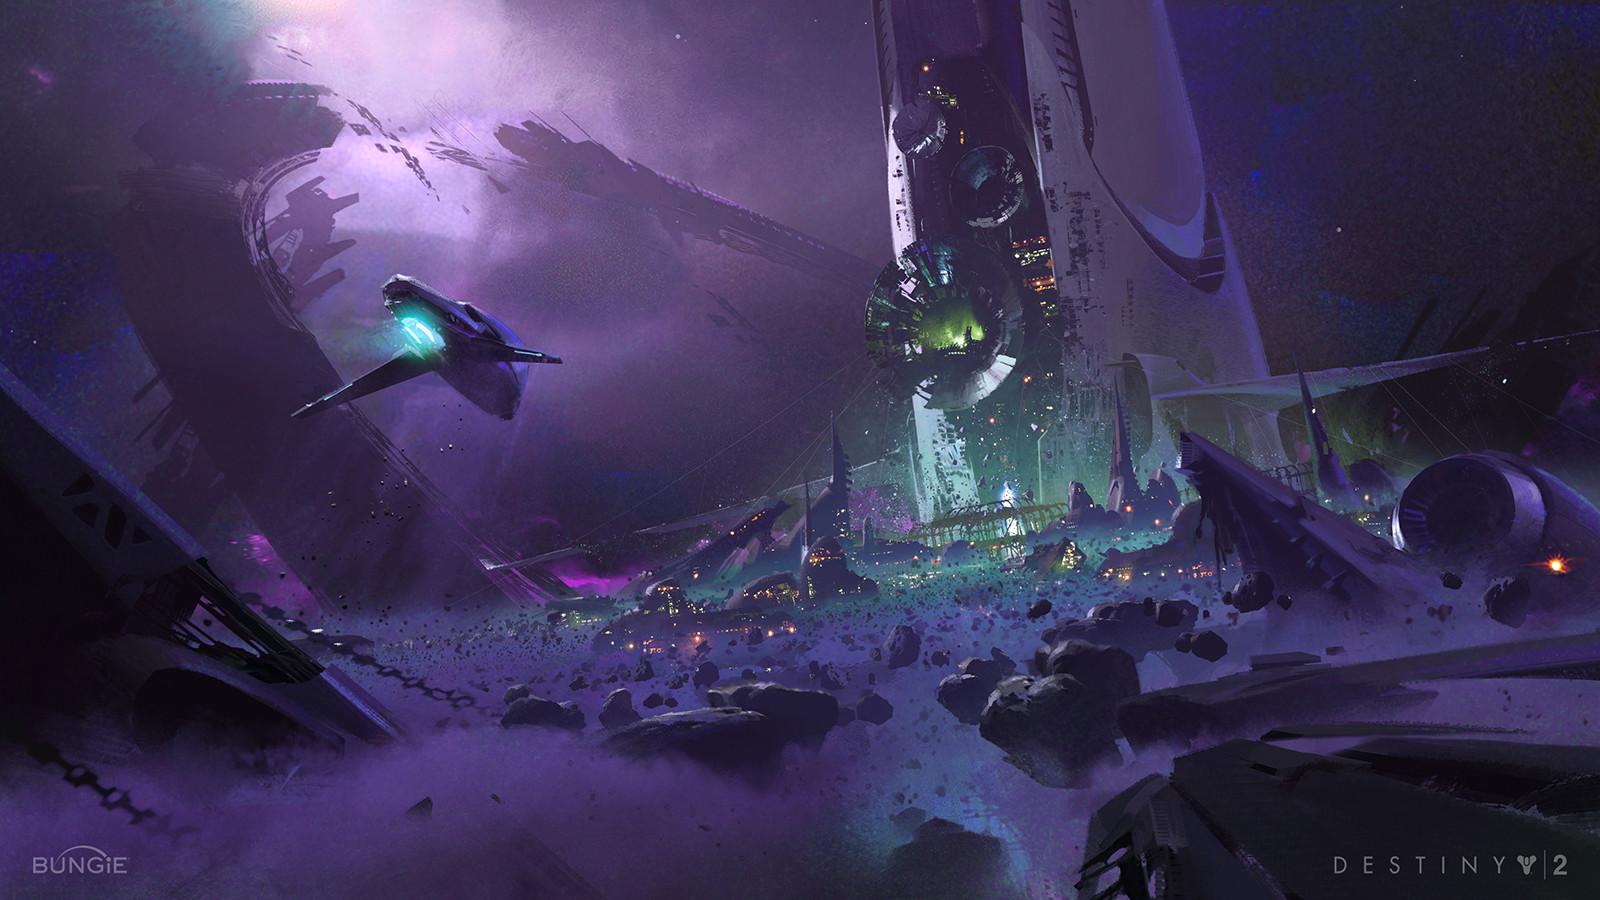 Destiny 2 Concept Art by Sung Choi | Concept Art World